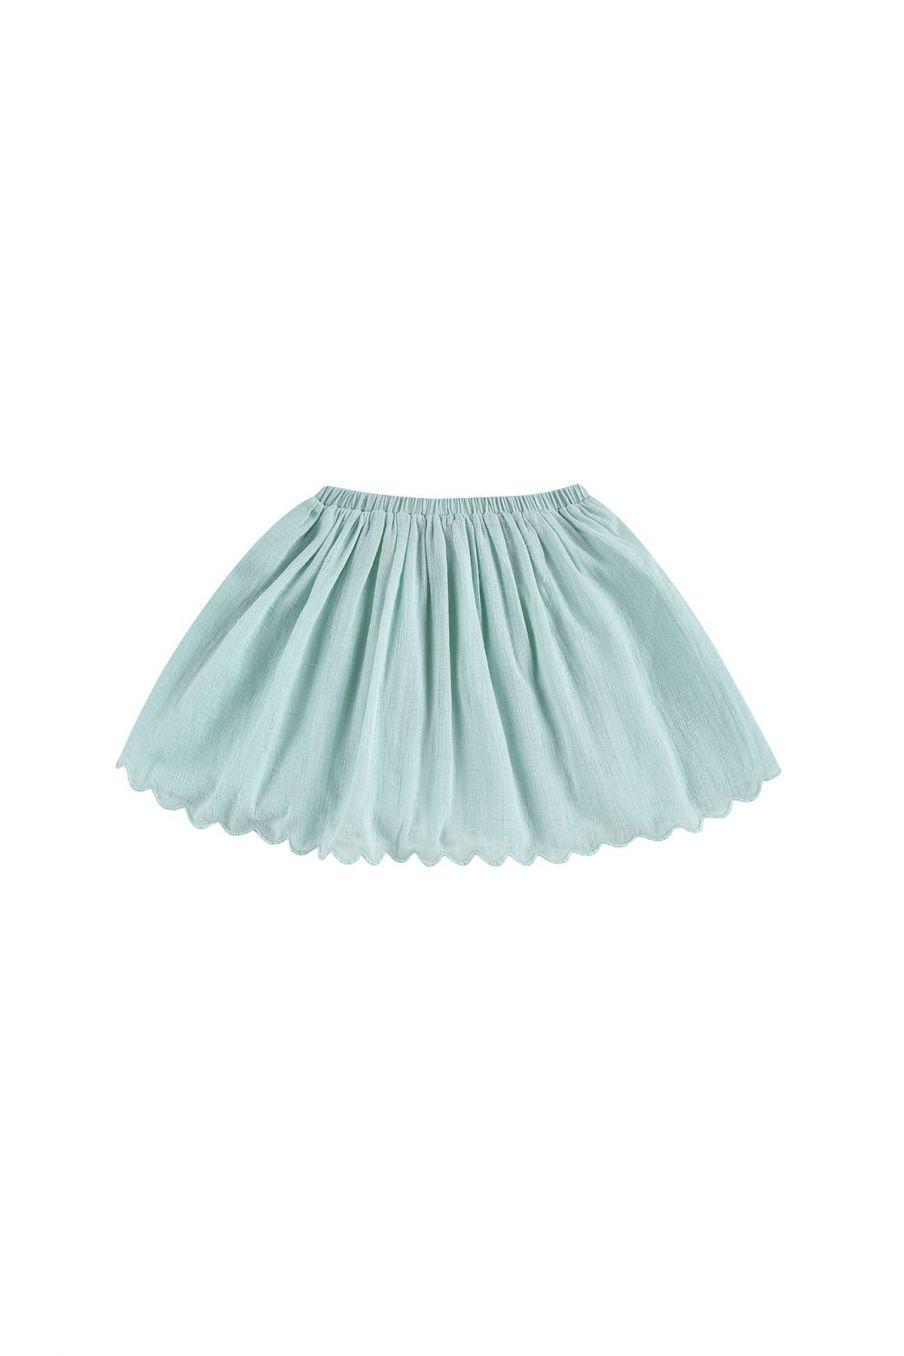 boheme chic vintage jupe fille riola amande